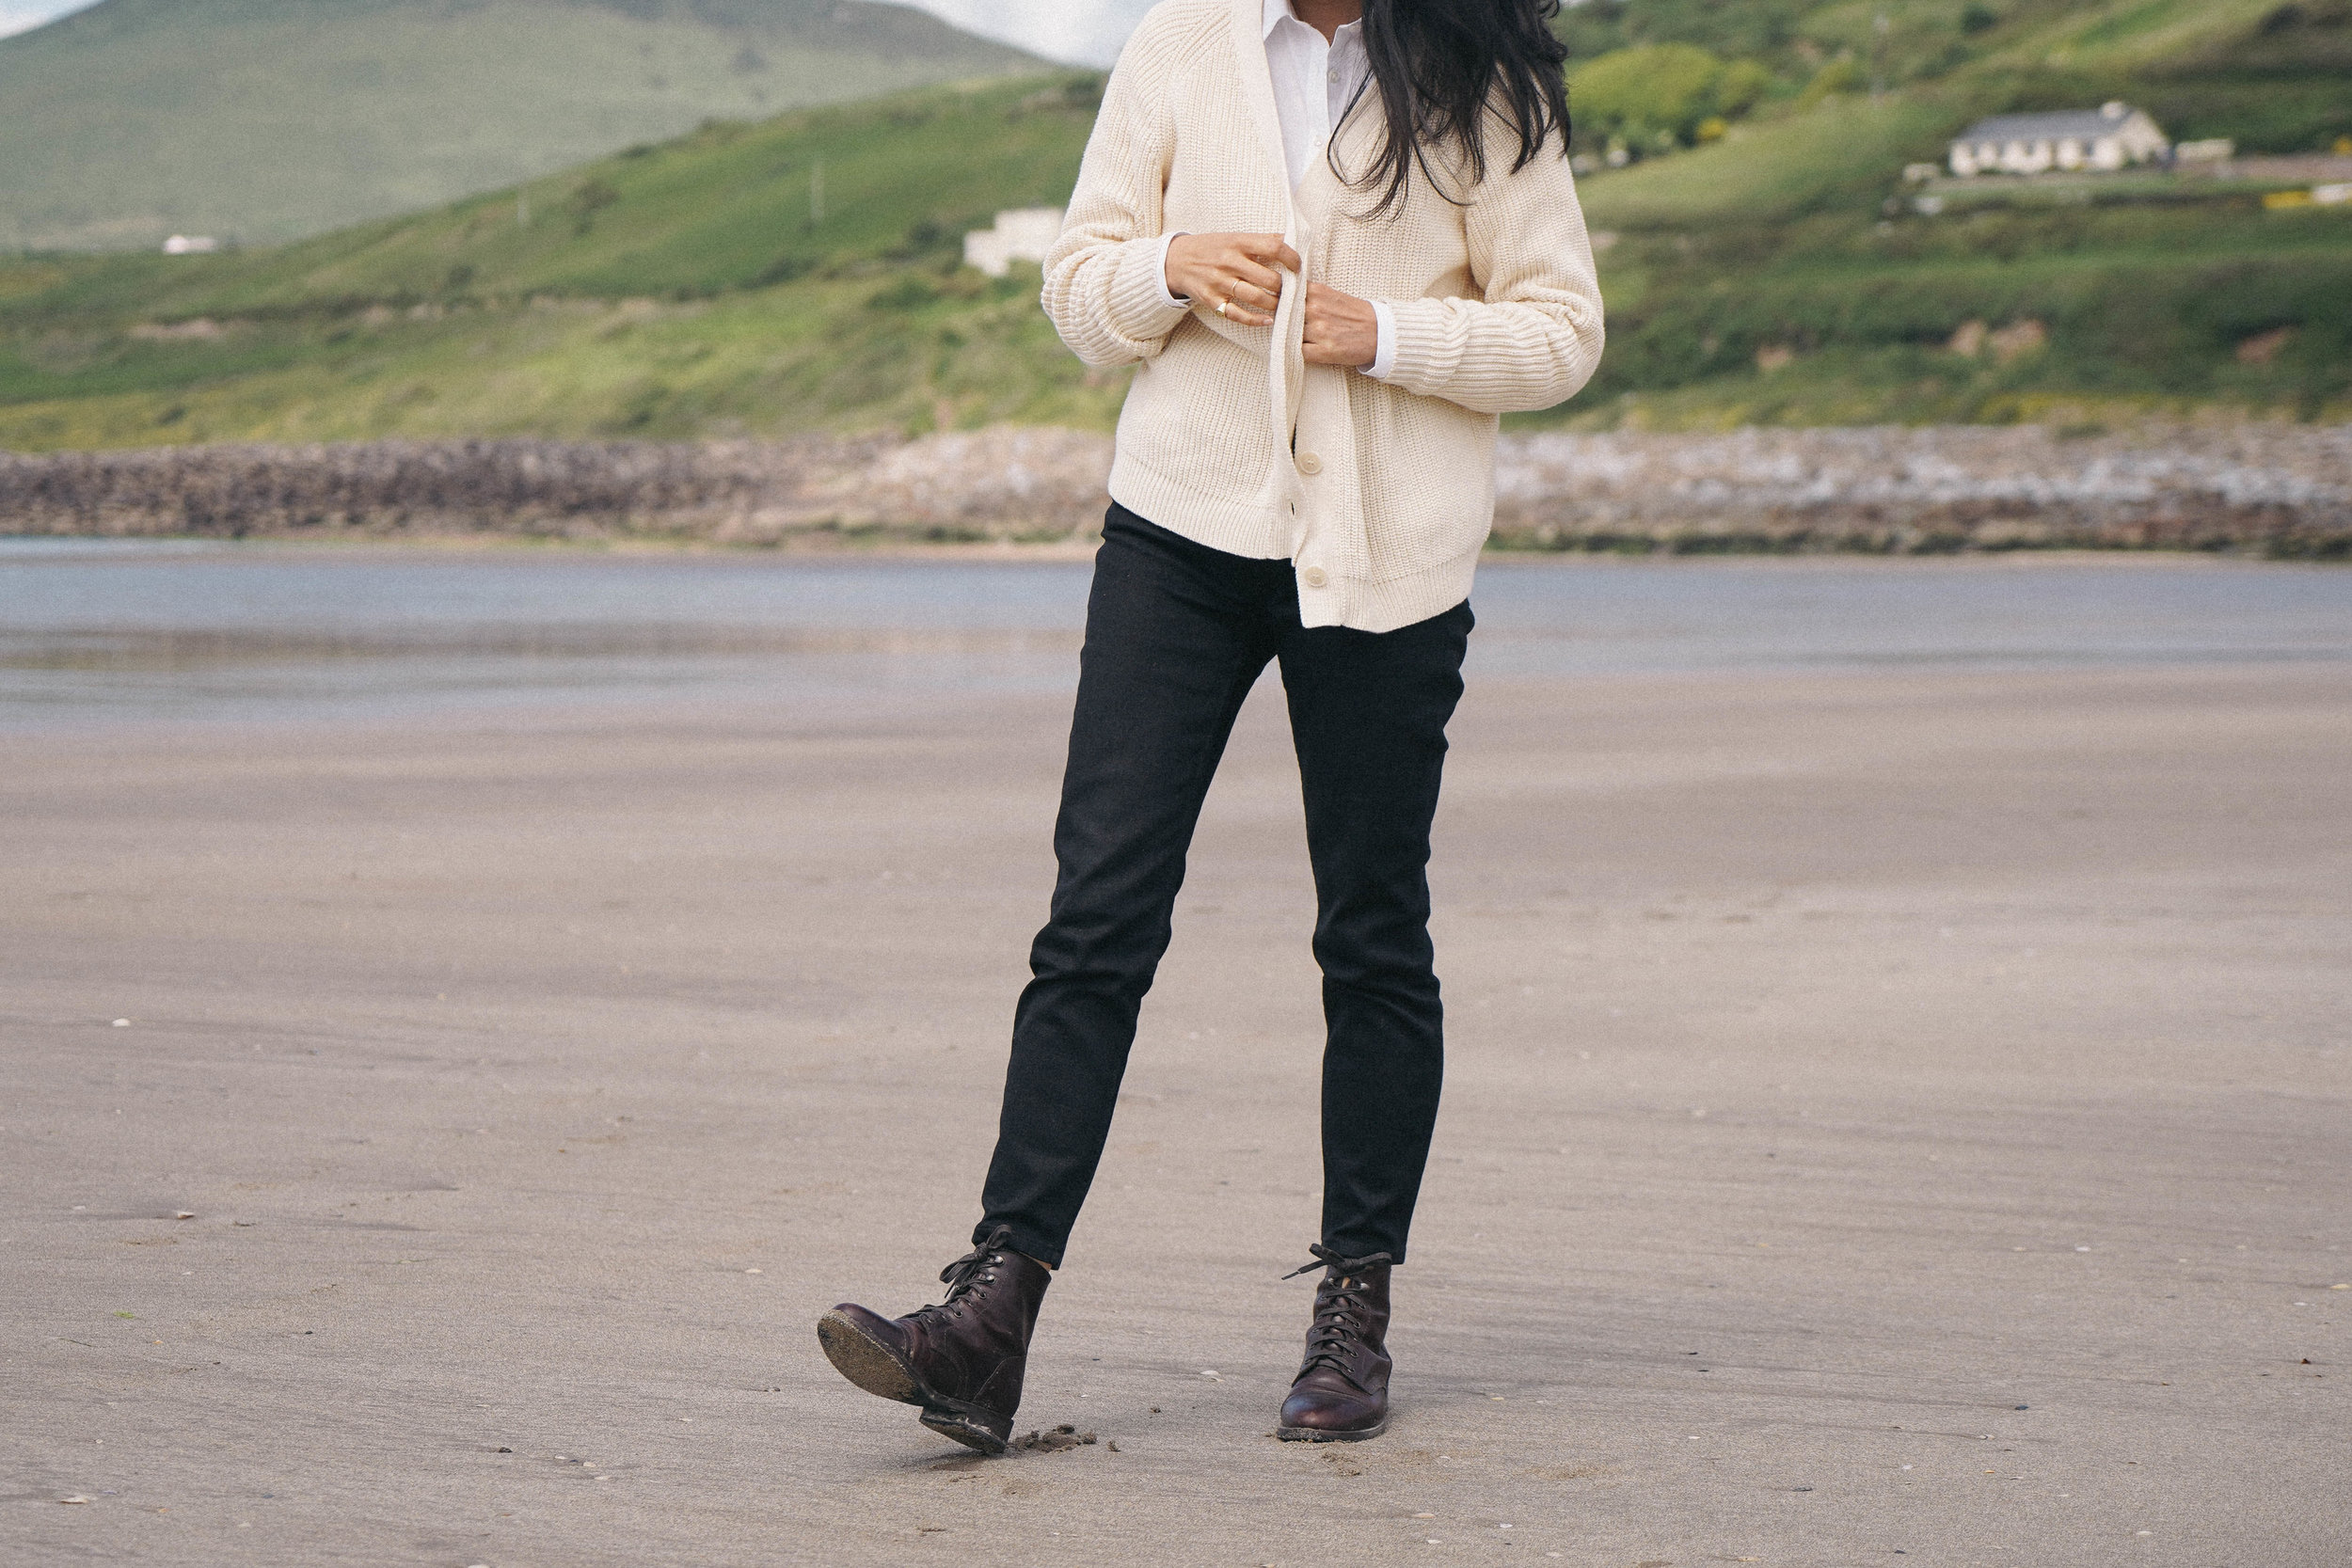 inch-beach-ireland-l'envers-sweater-thursday-boots-review.jpg